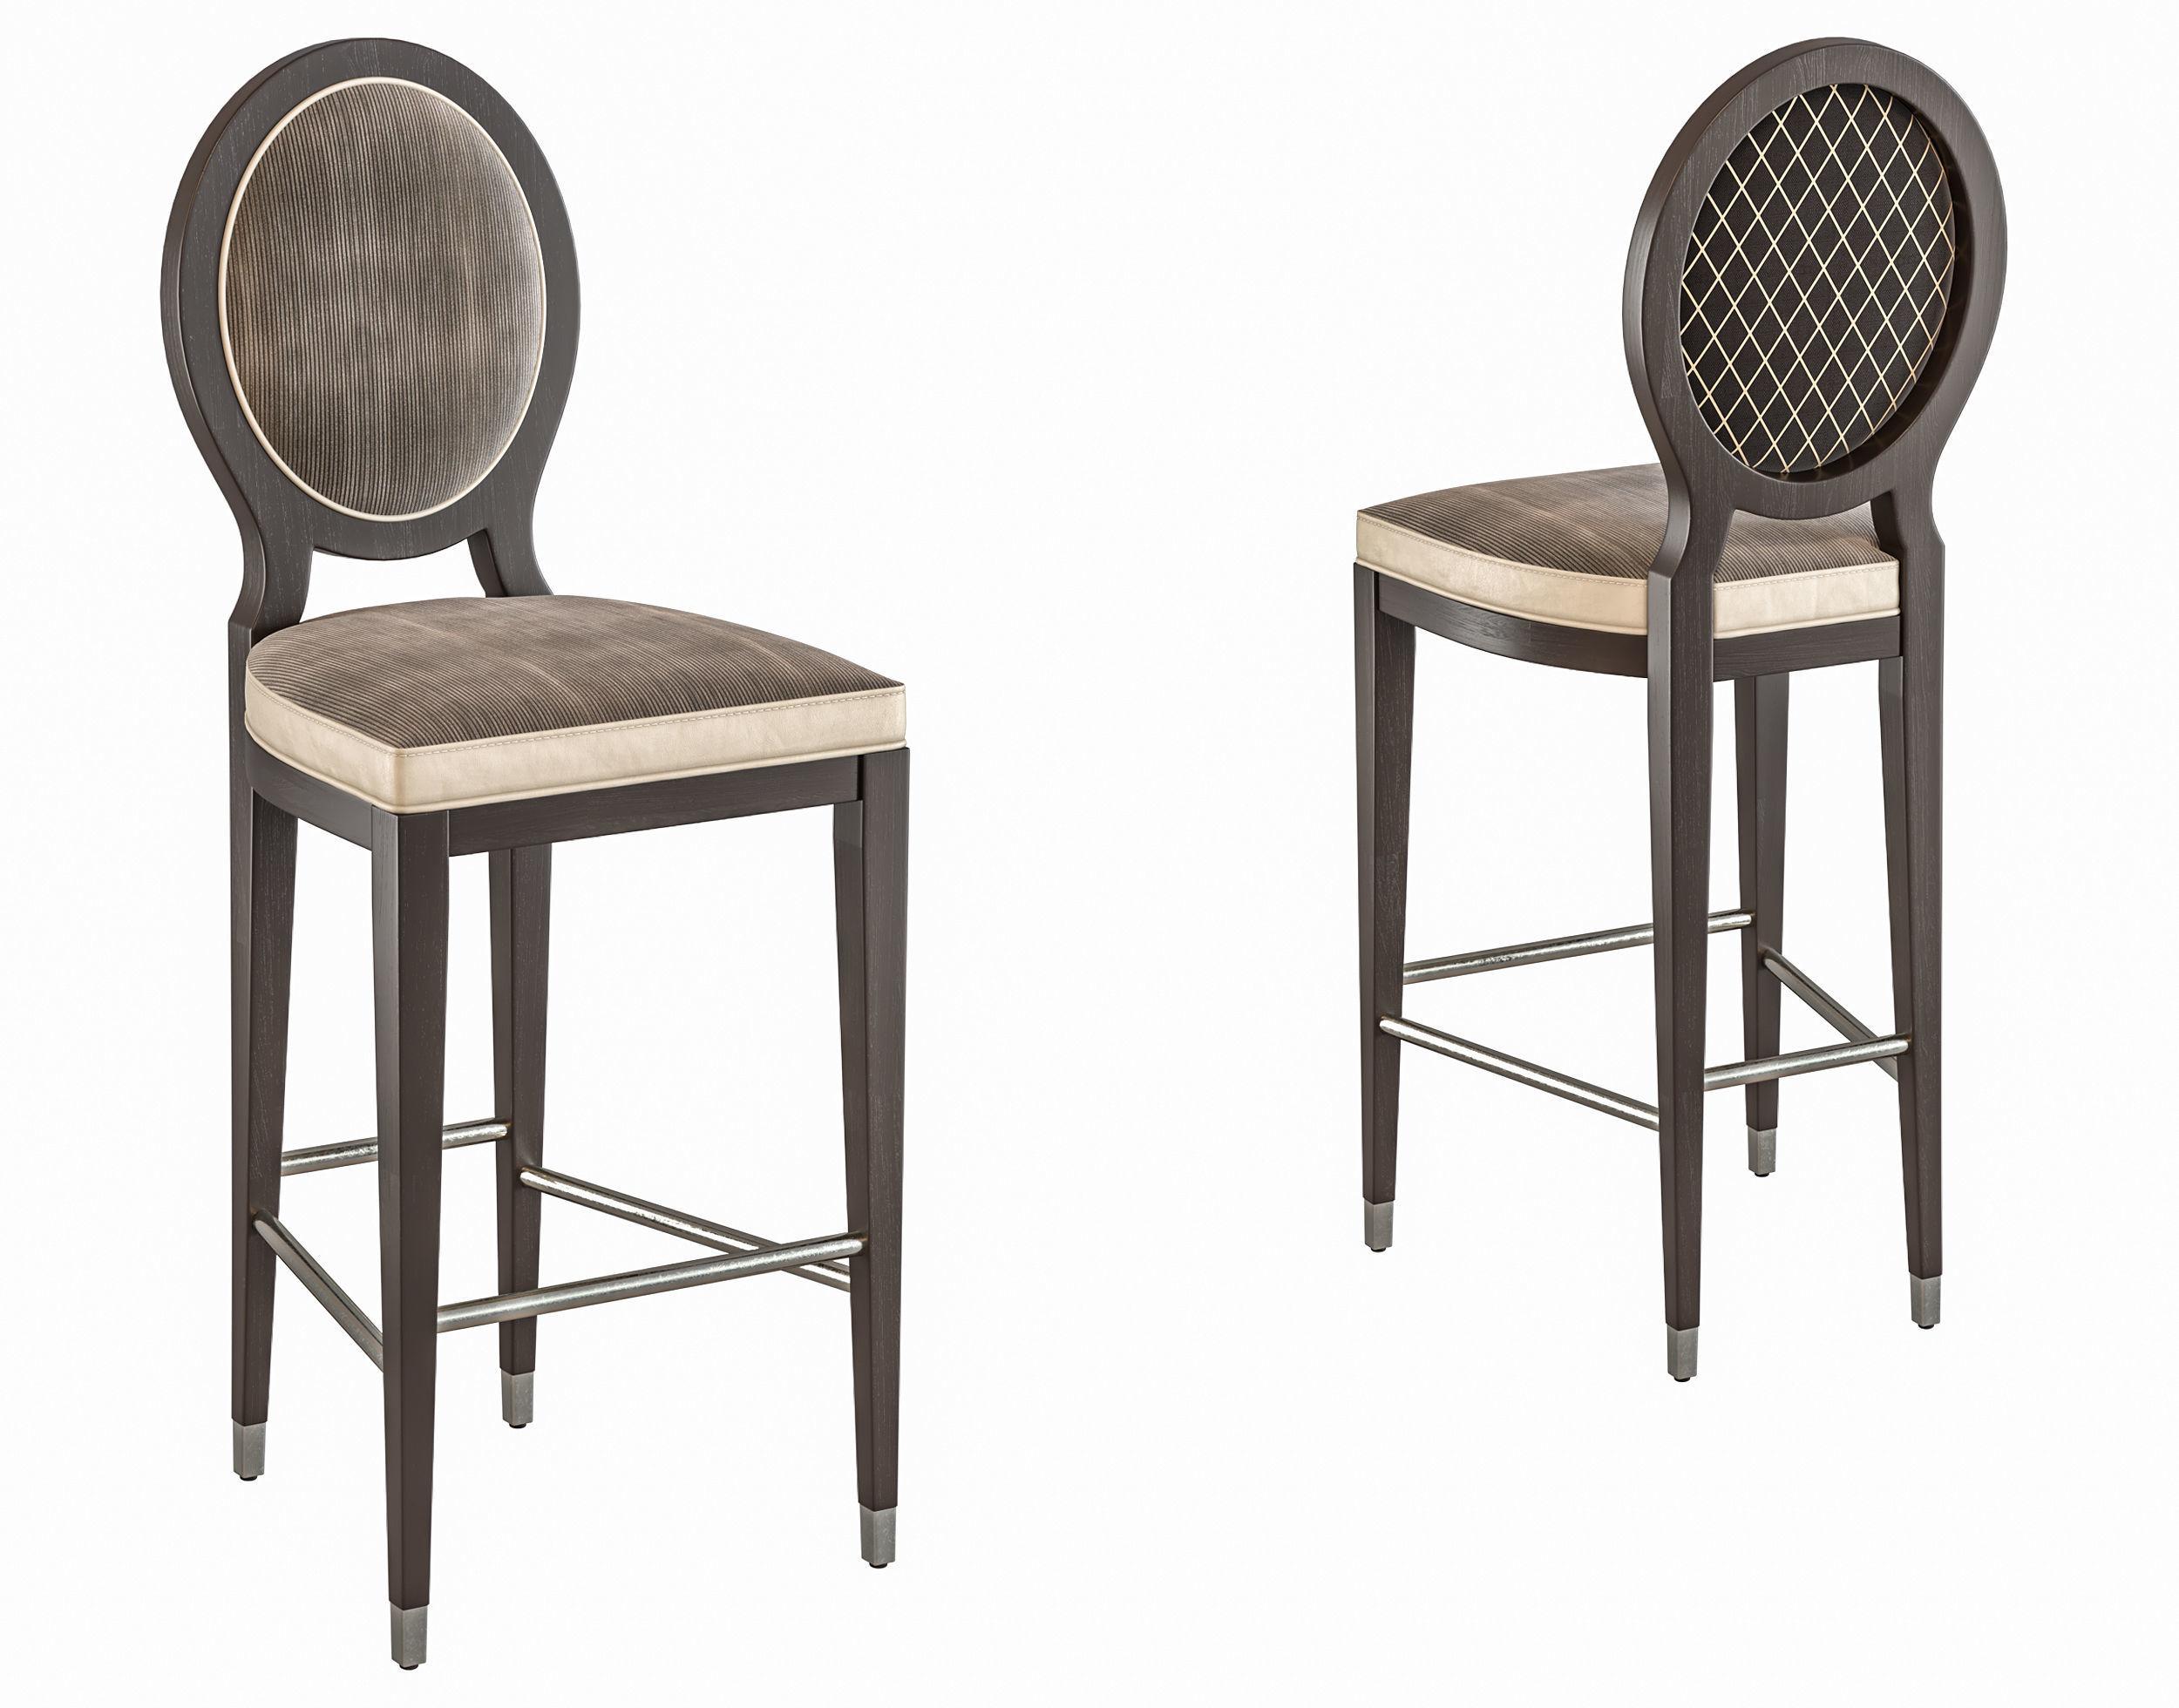 Swell Roche Bobois Grand Hotel Bar Stool 3D Model Machost Co Dining Chair Design Ideas Machostcouk